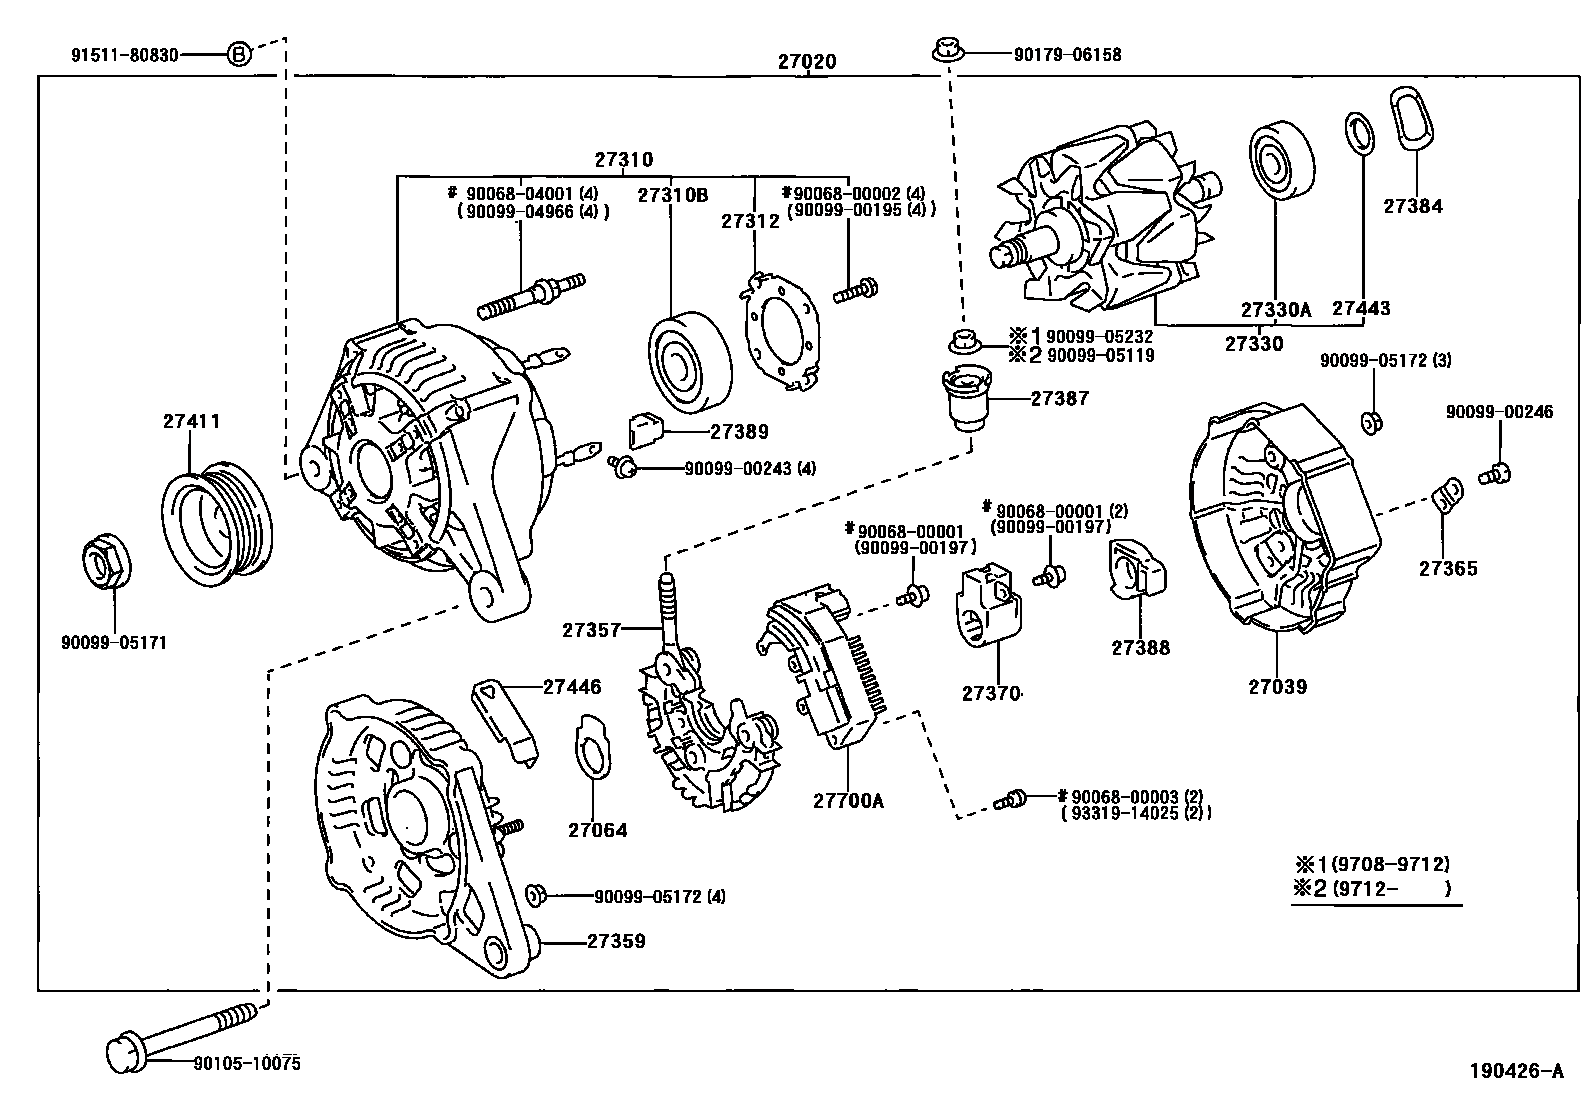 diy 1999 toyota corolla ve 1zzfe engine alternator exploded diagram 2003 ford f 250 engine diagram toyota corolla 2010 engine diagram [ 1592 x 1099 Pixel ]